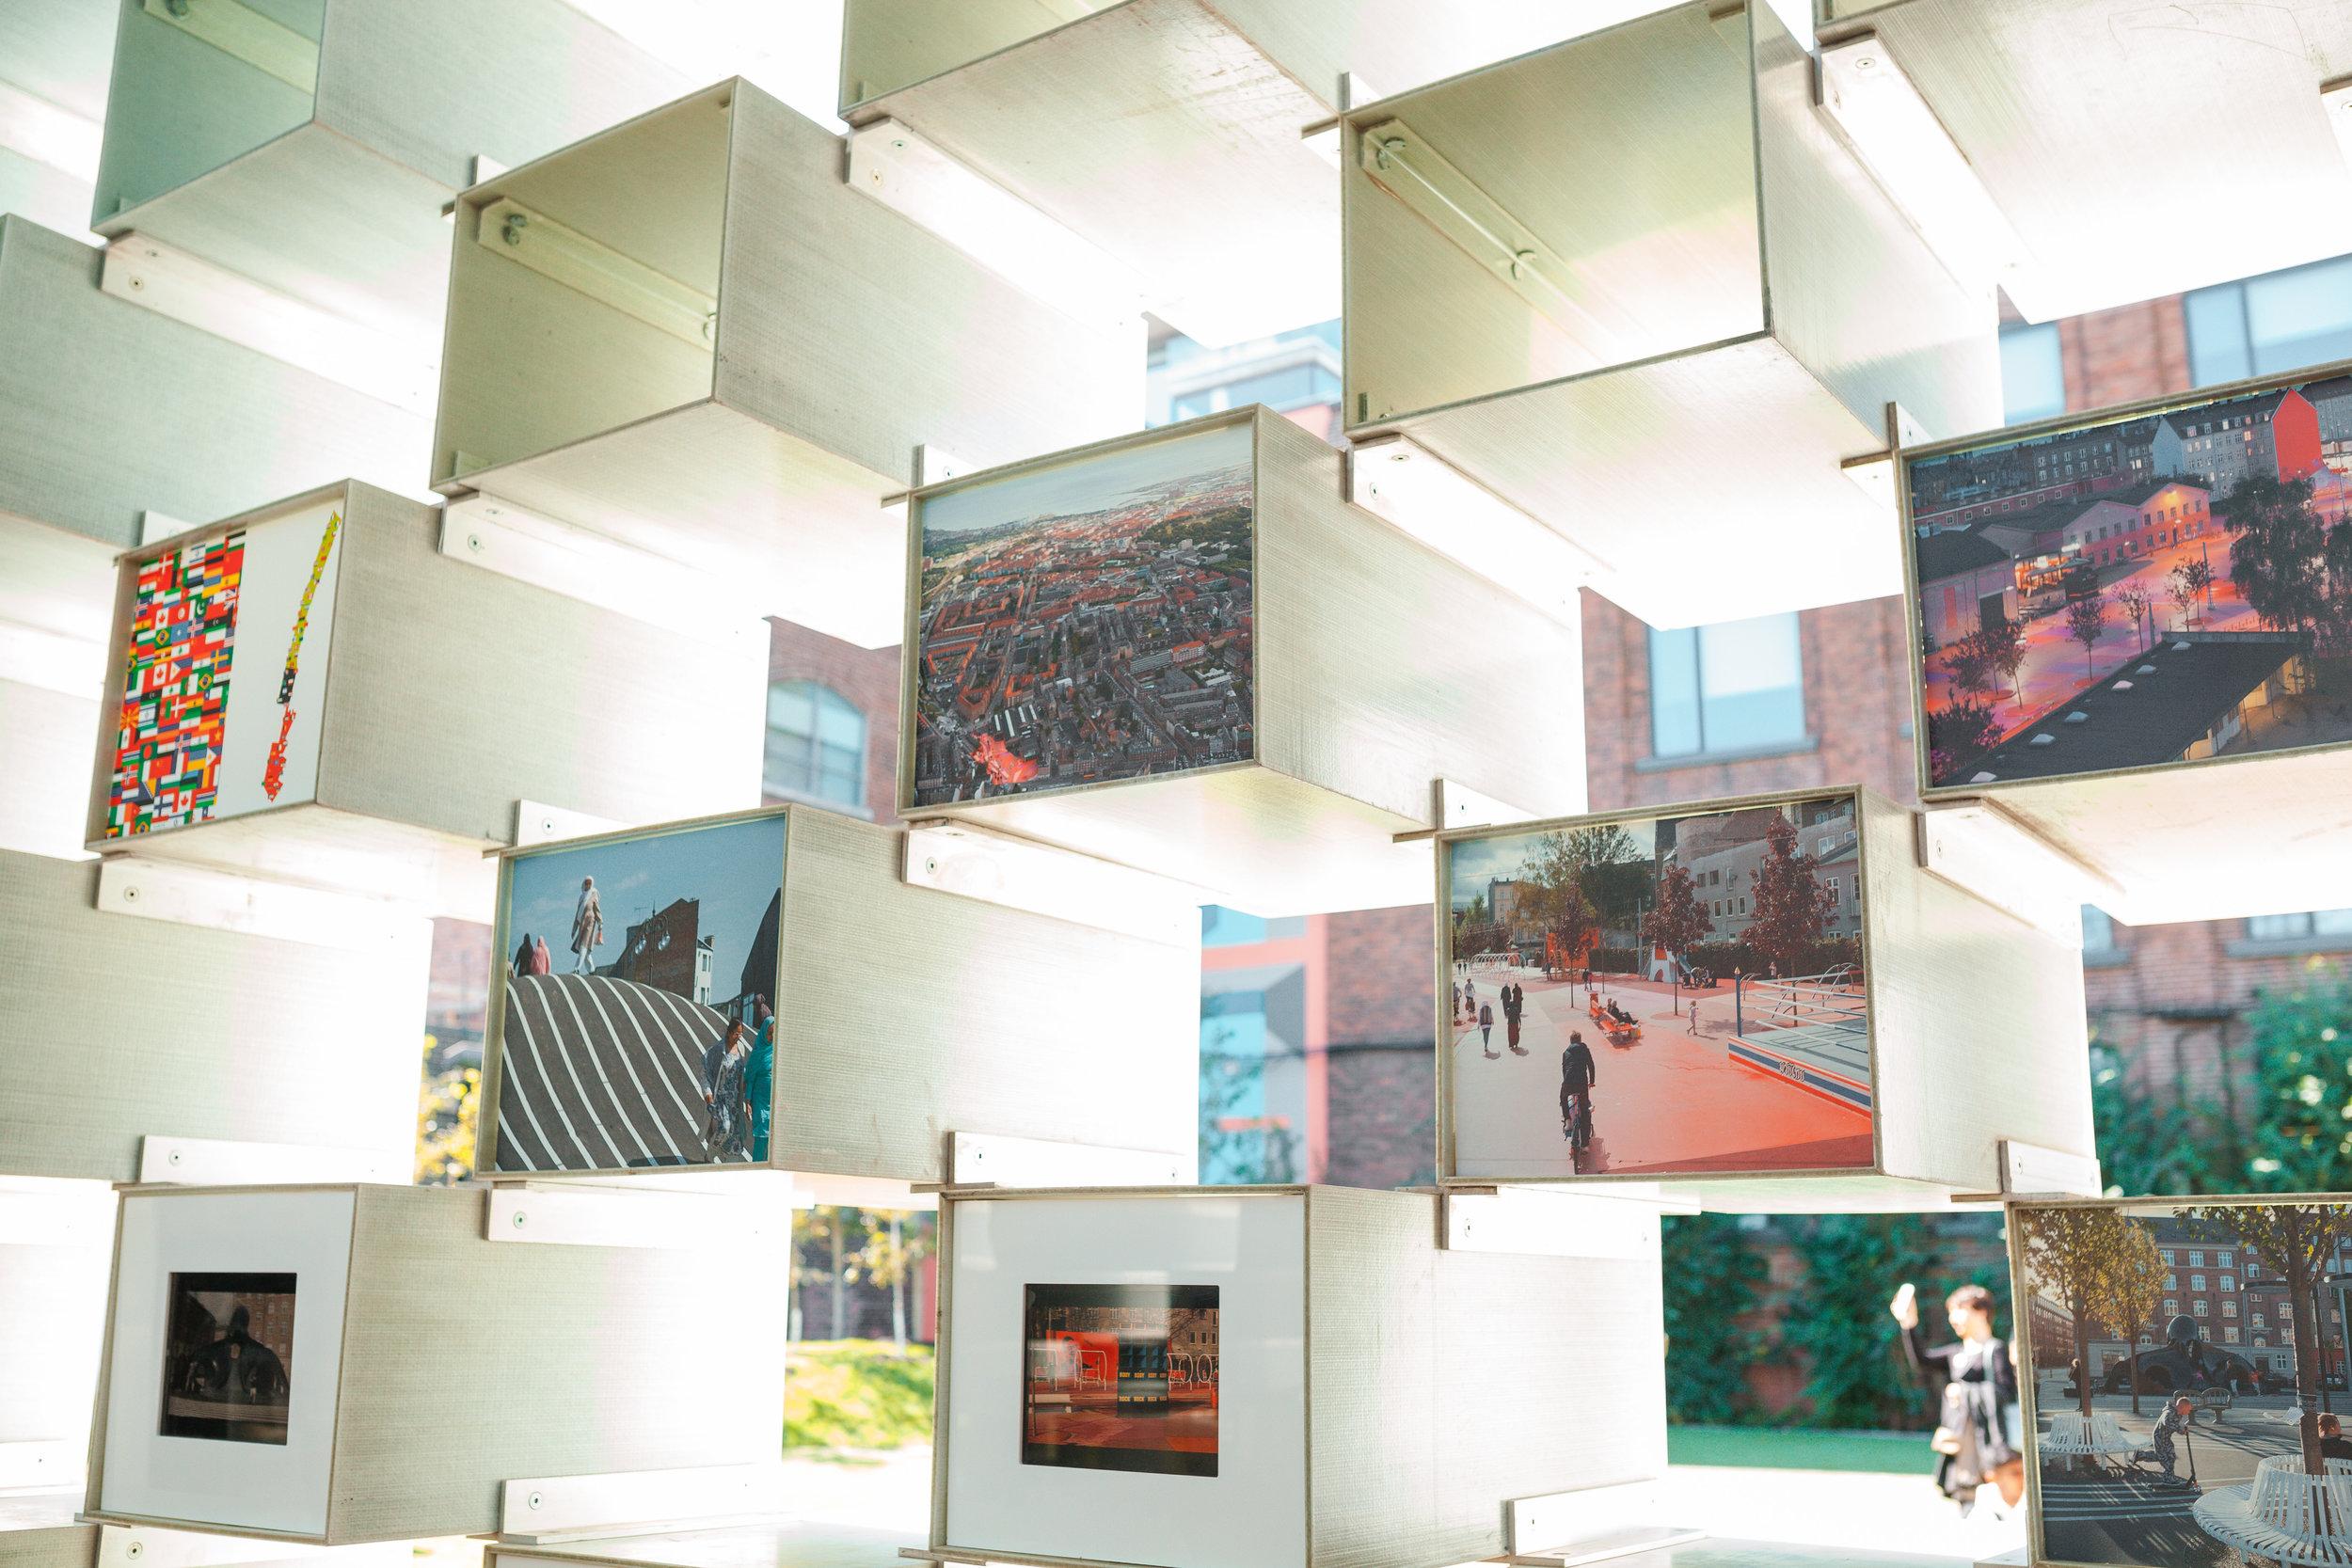 Unzipped paviion Bjarke Ingels Toronto Architecture Toronto Architect Ontario Design Westfield Katia Marten Blogger After 50